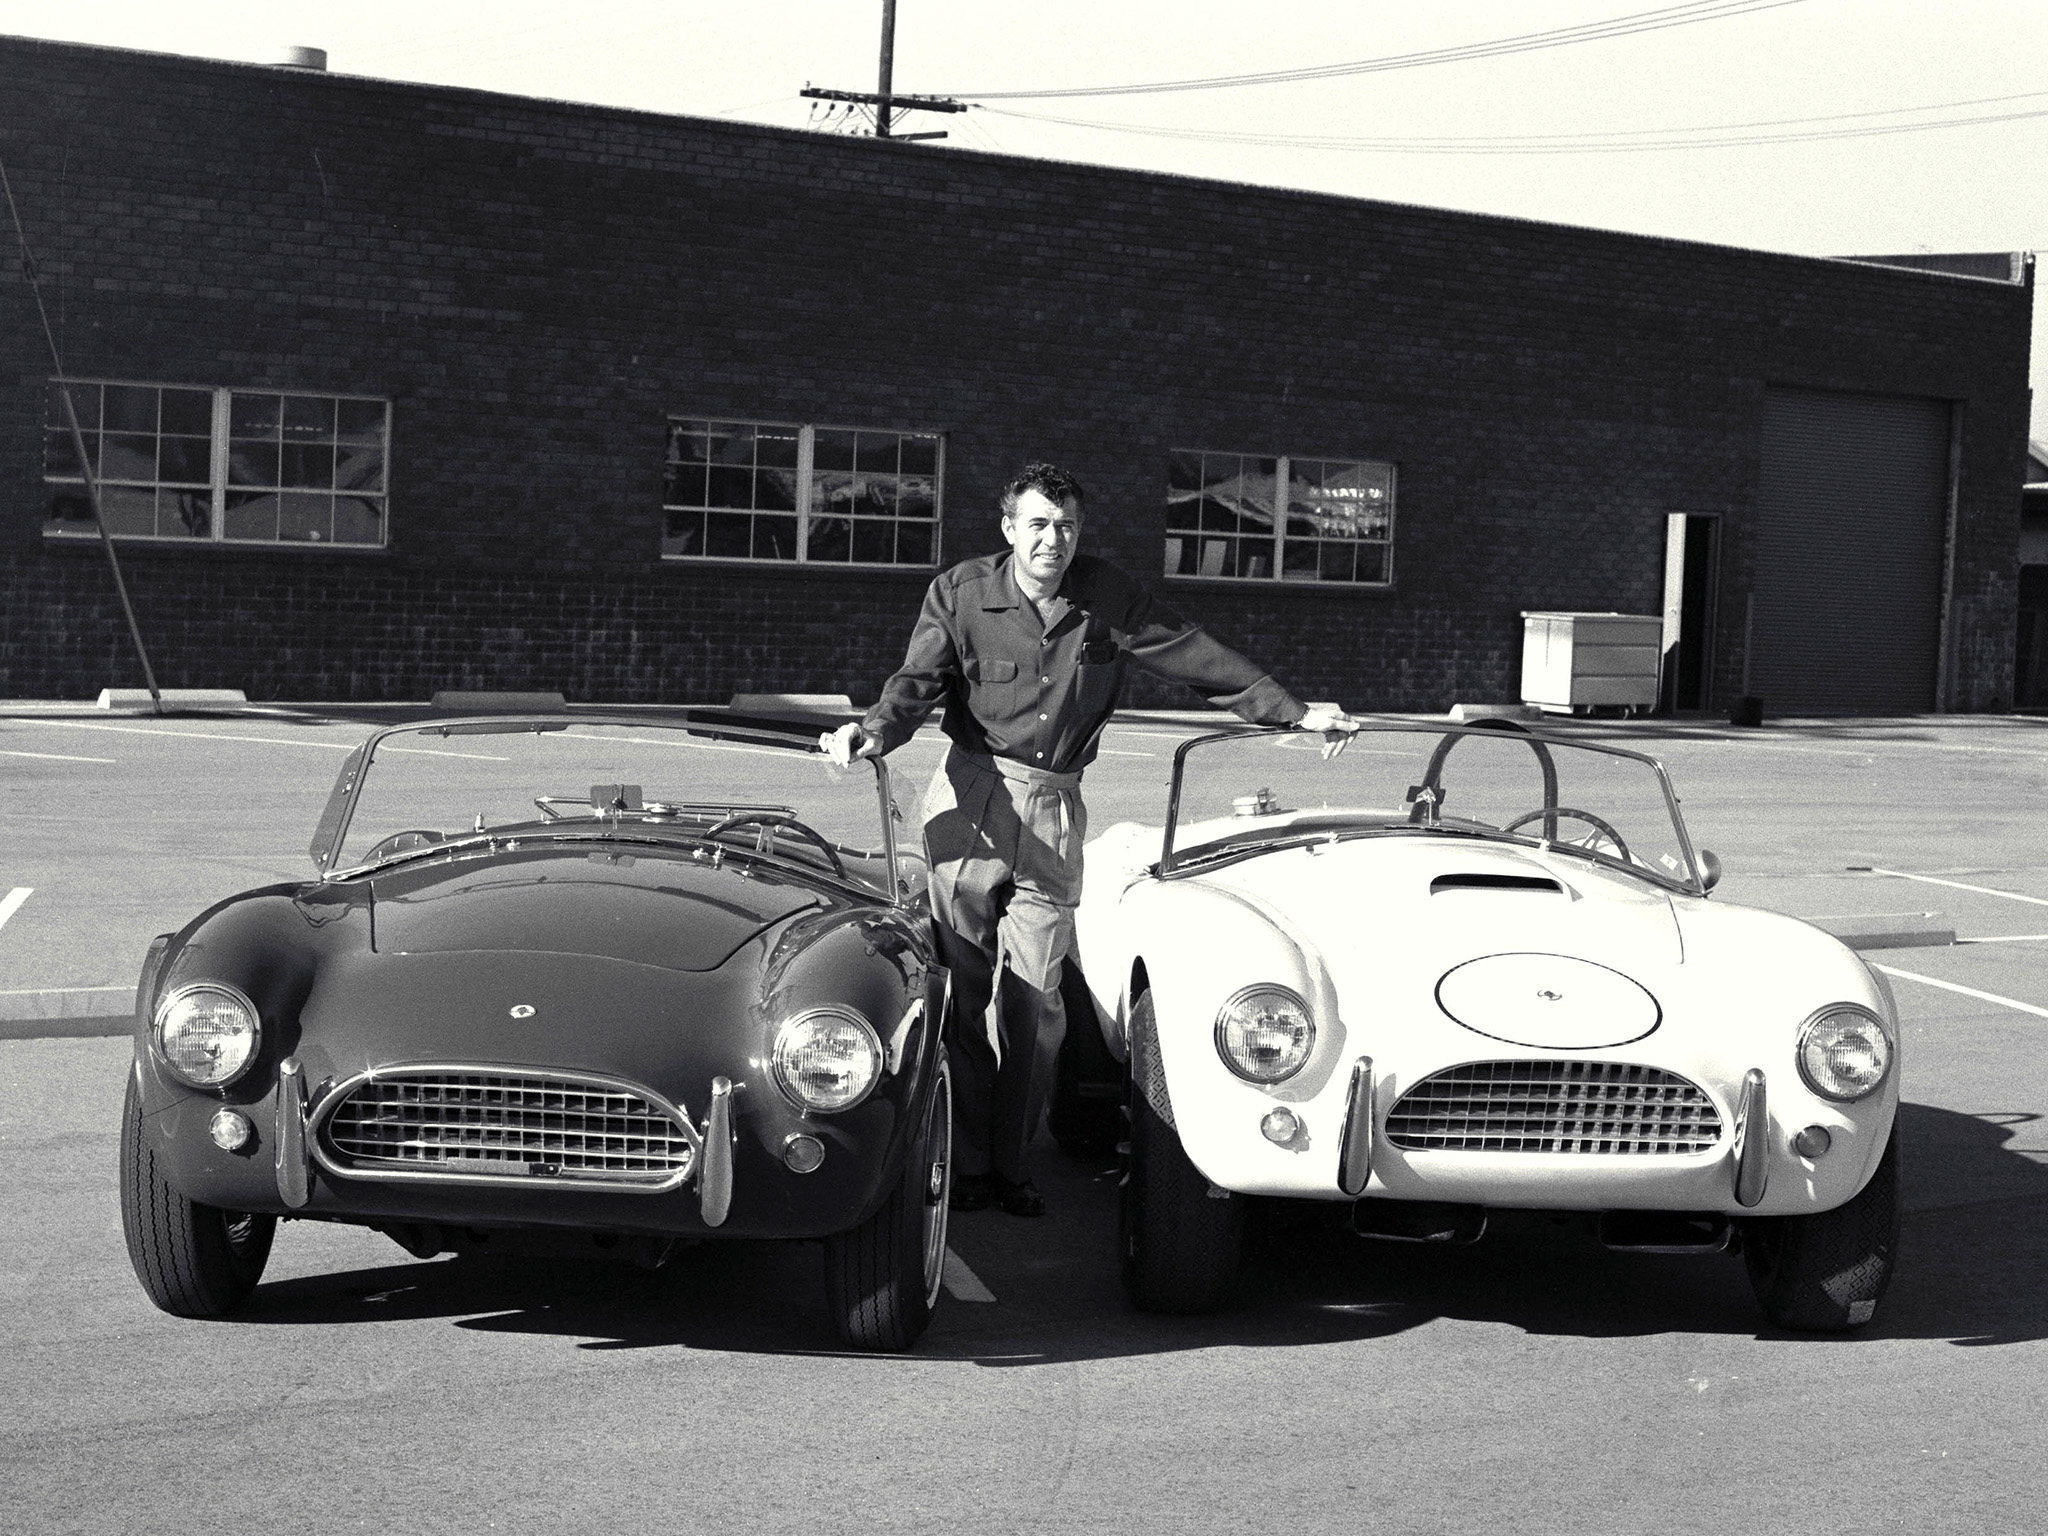 I když měla Cobra americký motor, vyrobila jej automobilka AC Cars v Anglii.